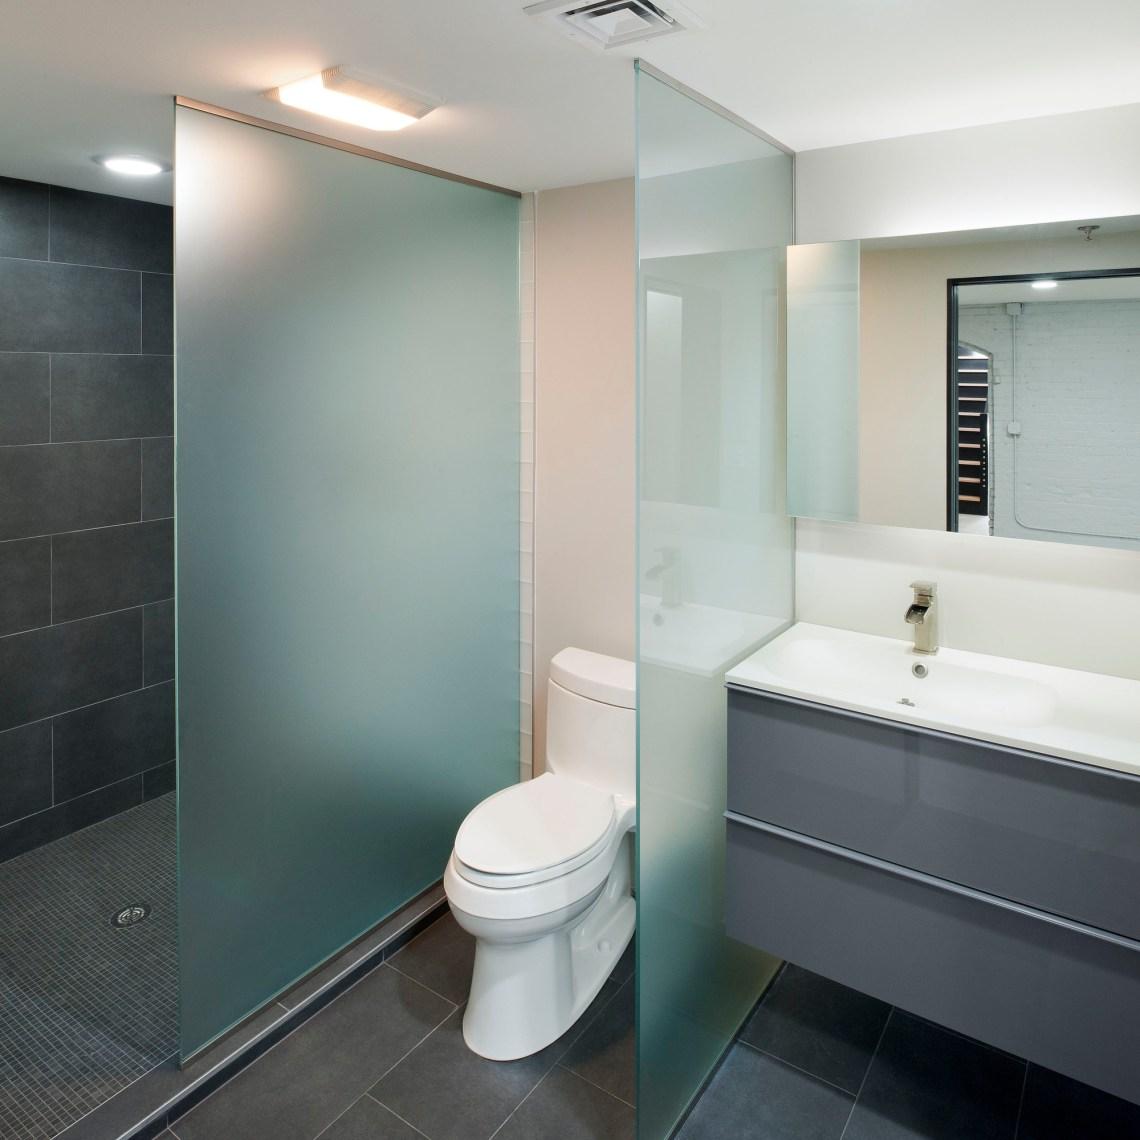 Image Result For Modular Small Bathroom Designs Bathroom Wall Tile Ideas Designs At Home Design